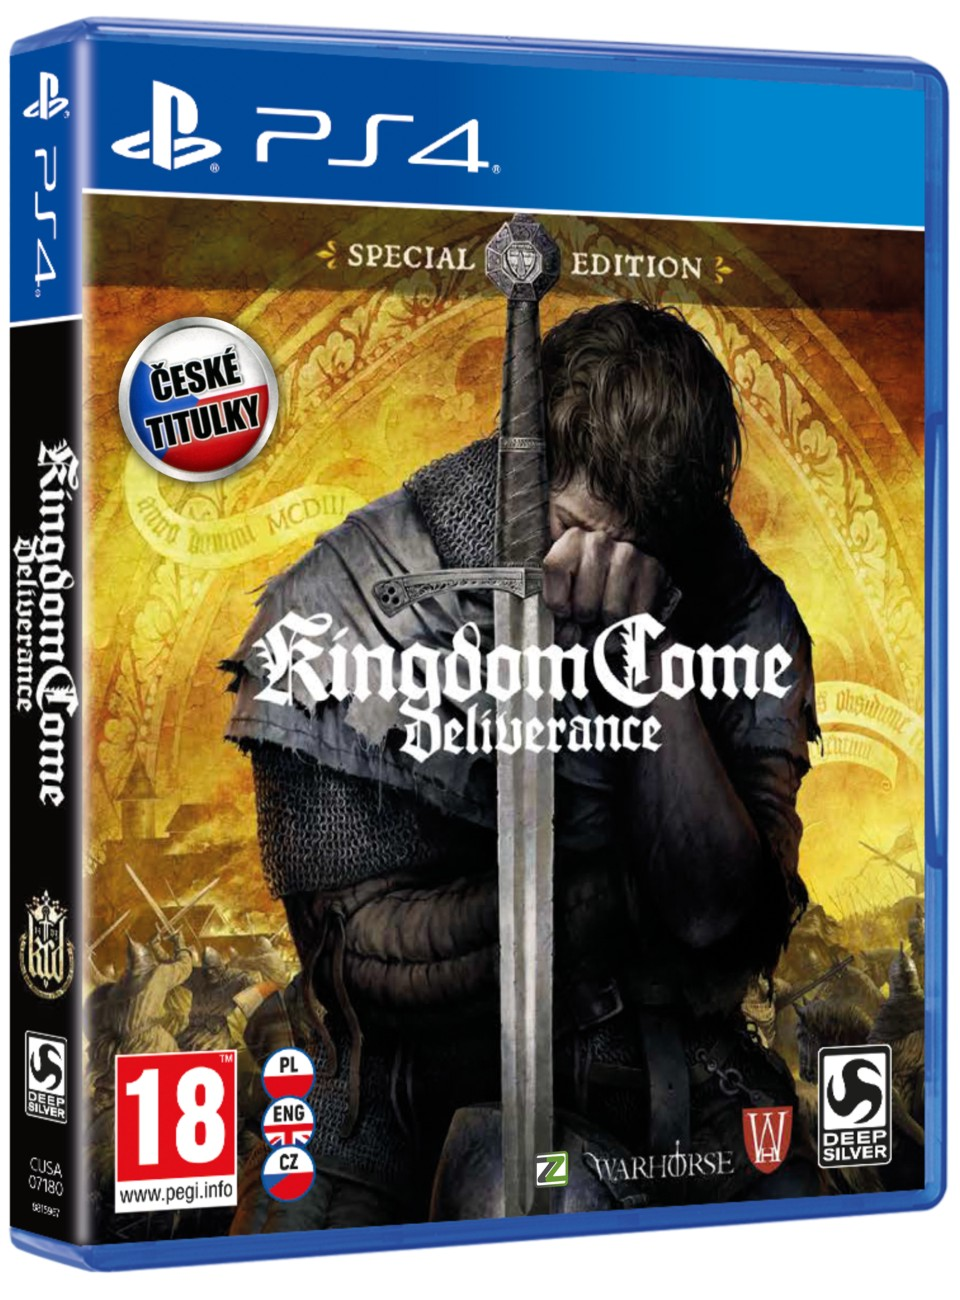 Kingdom Come: Deliverance (Special edition) - PS4